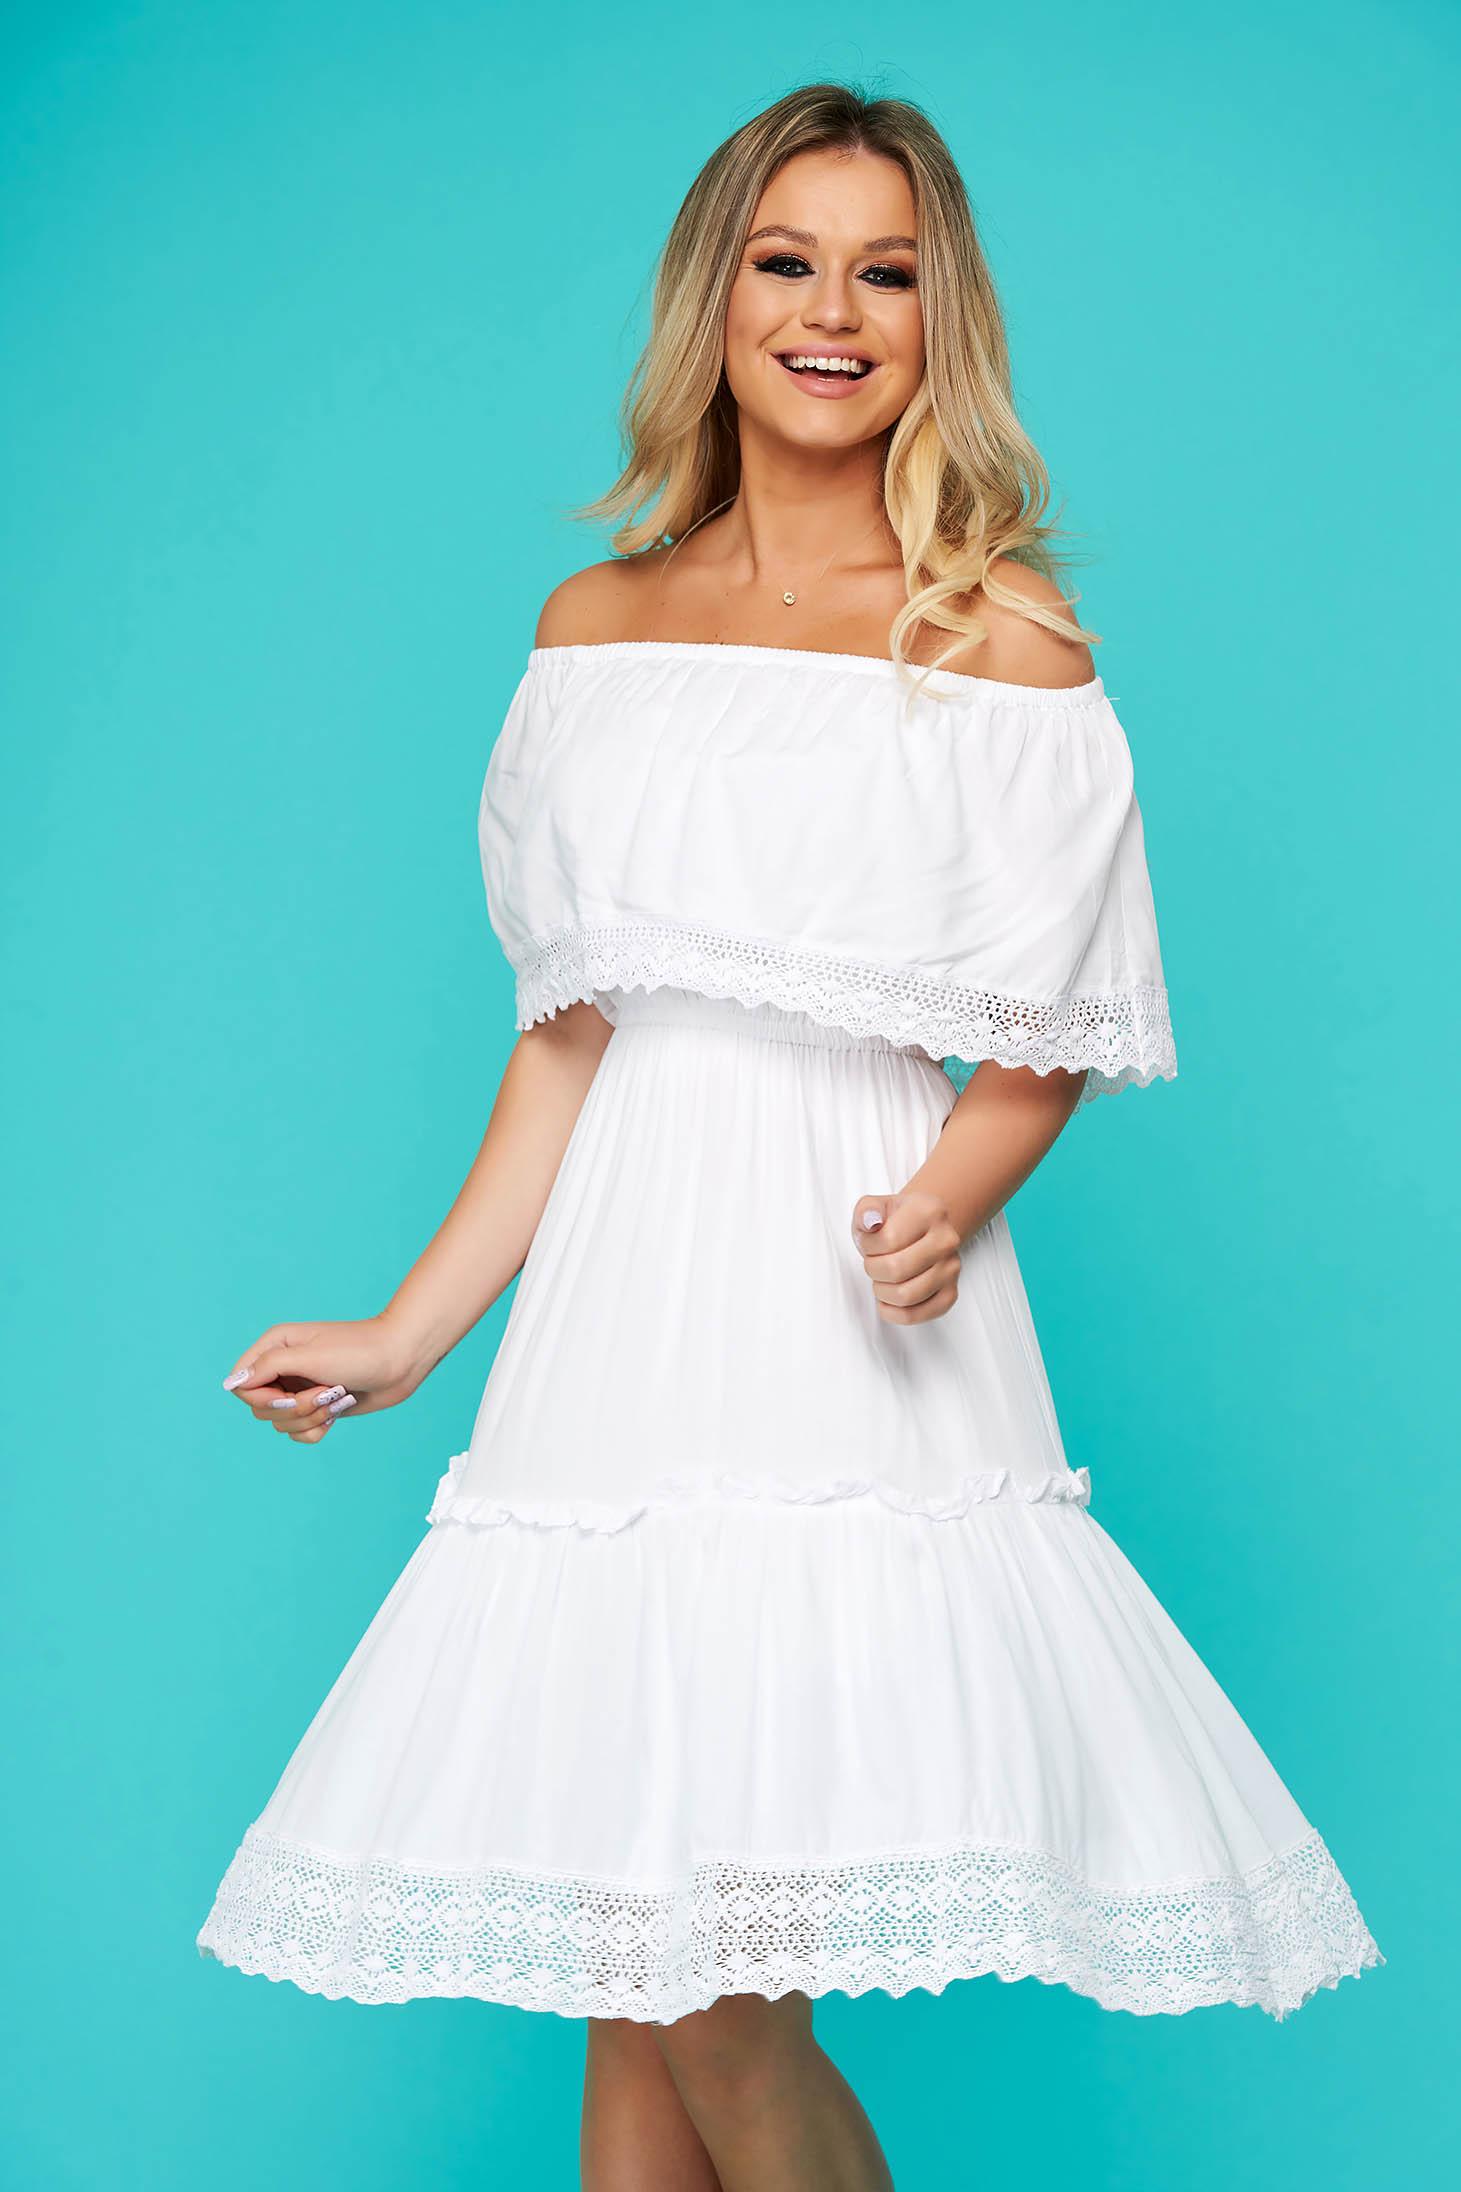 White dress short cut daily cloche guipure